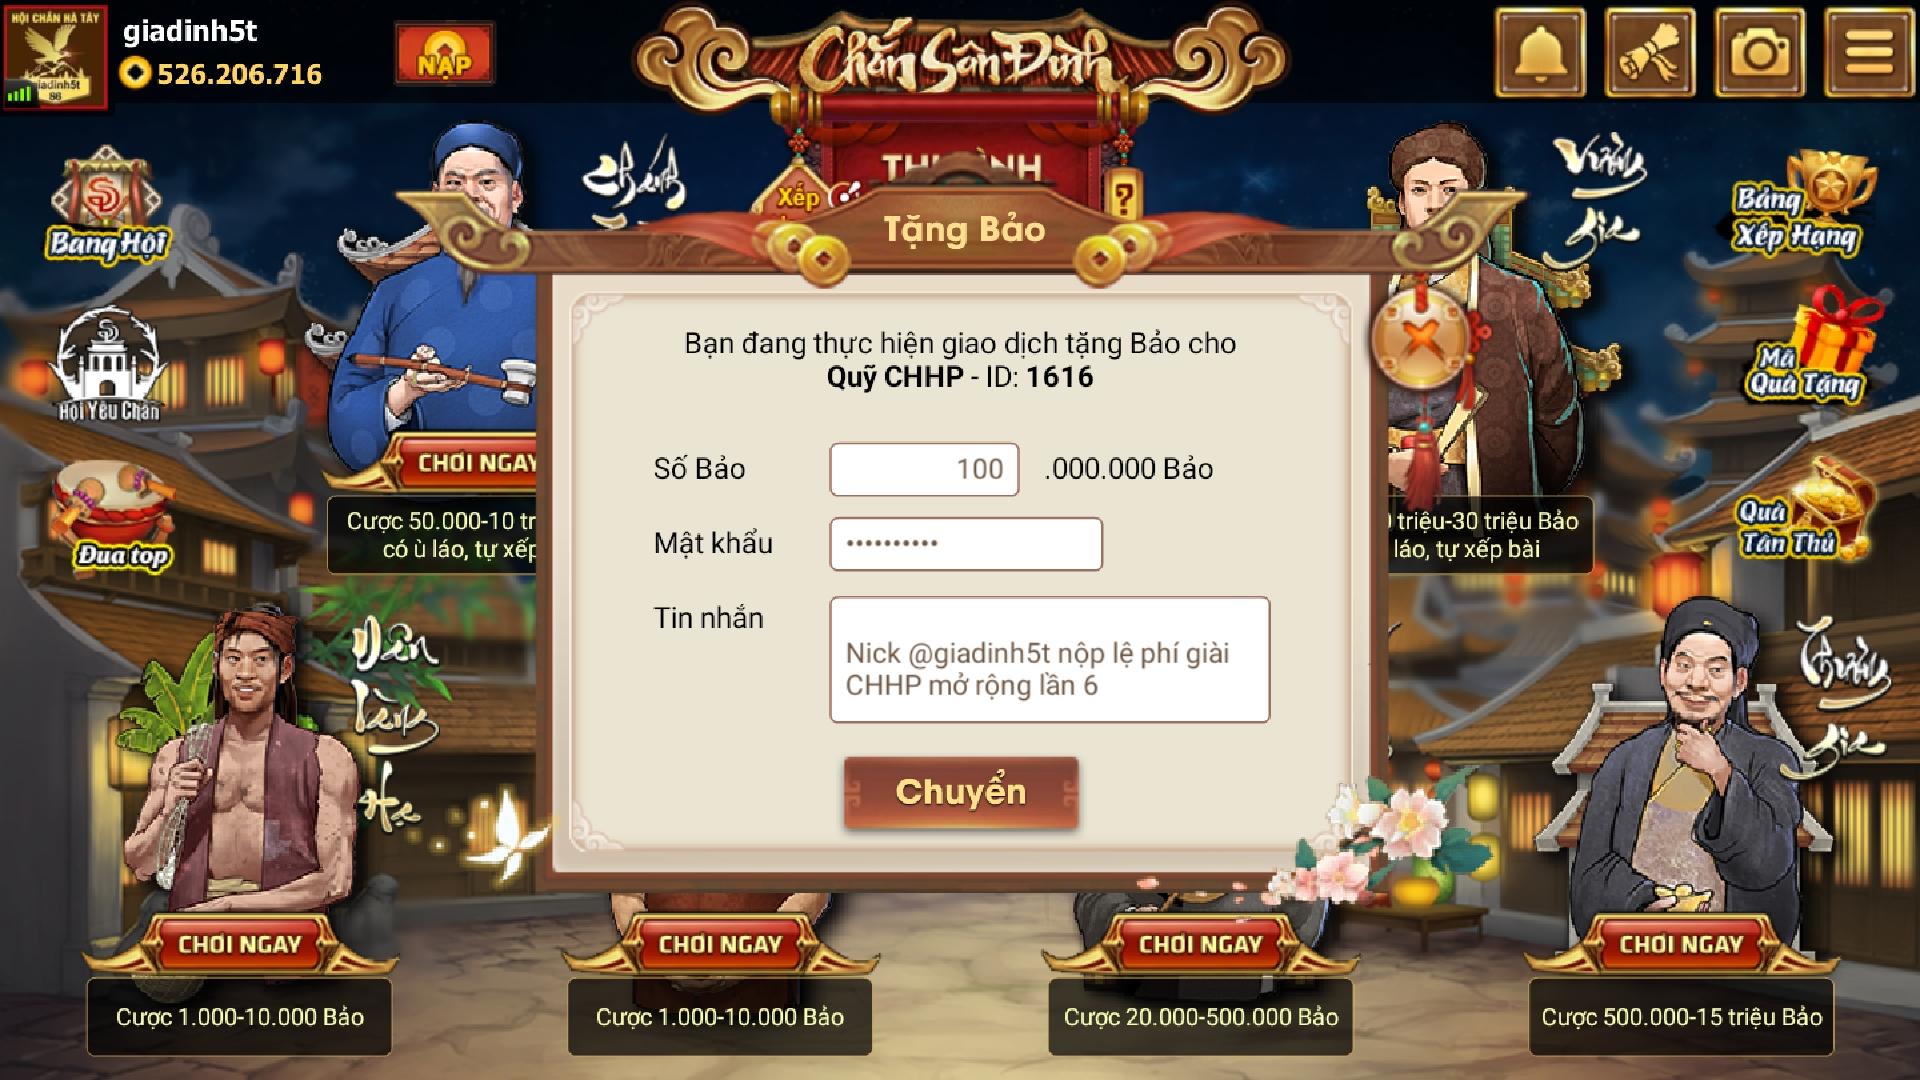 Screenshot_20200527-200056_Chn Sn nh.